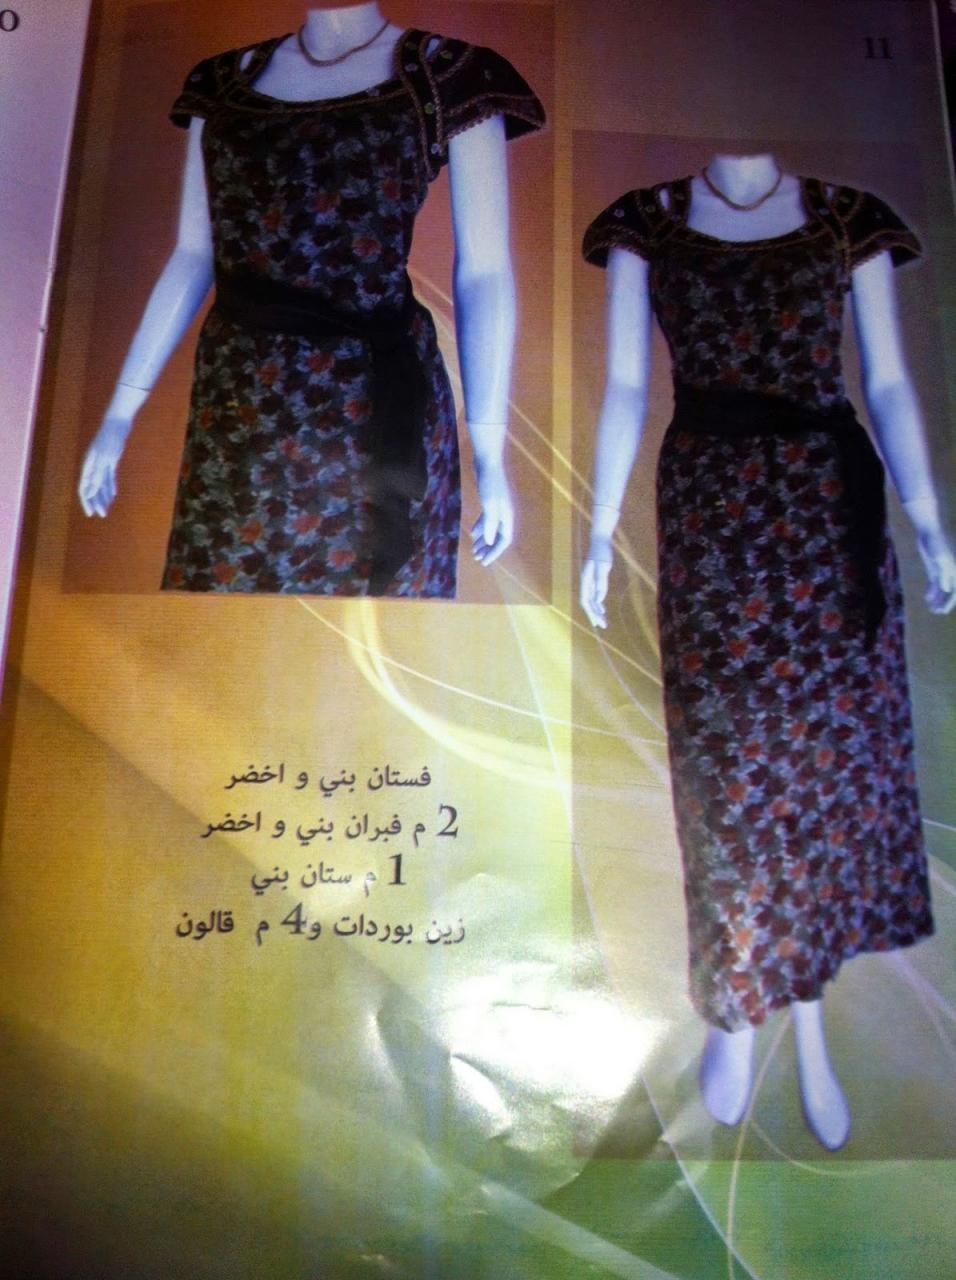 بالصور قنادر العيد 2019 خطوبة وسهرات 20160716 1382